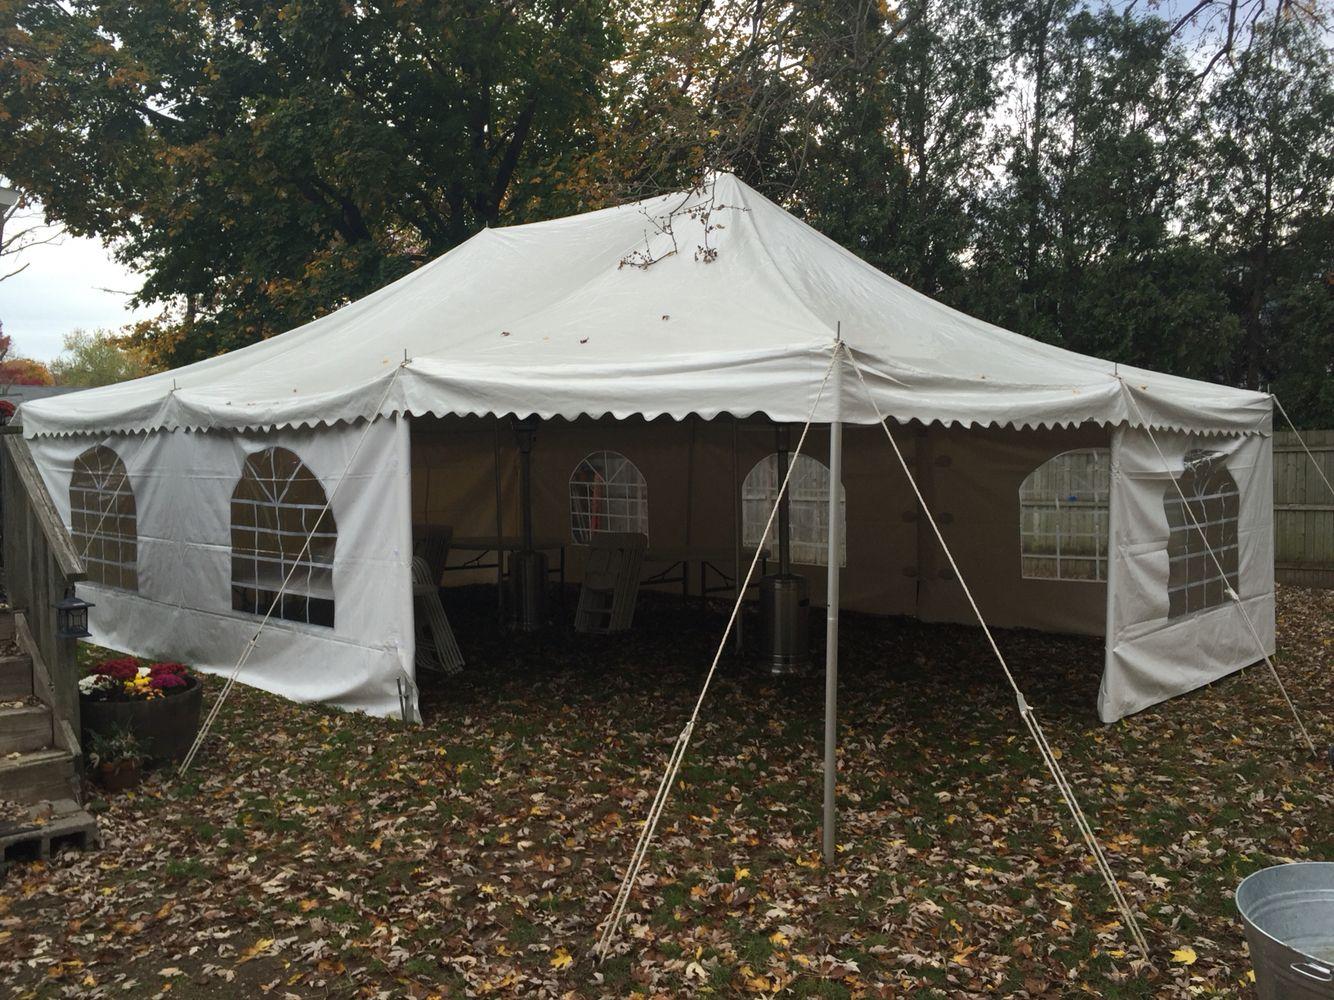 Avenue party rentals 6314844977 long island ny tents